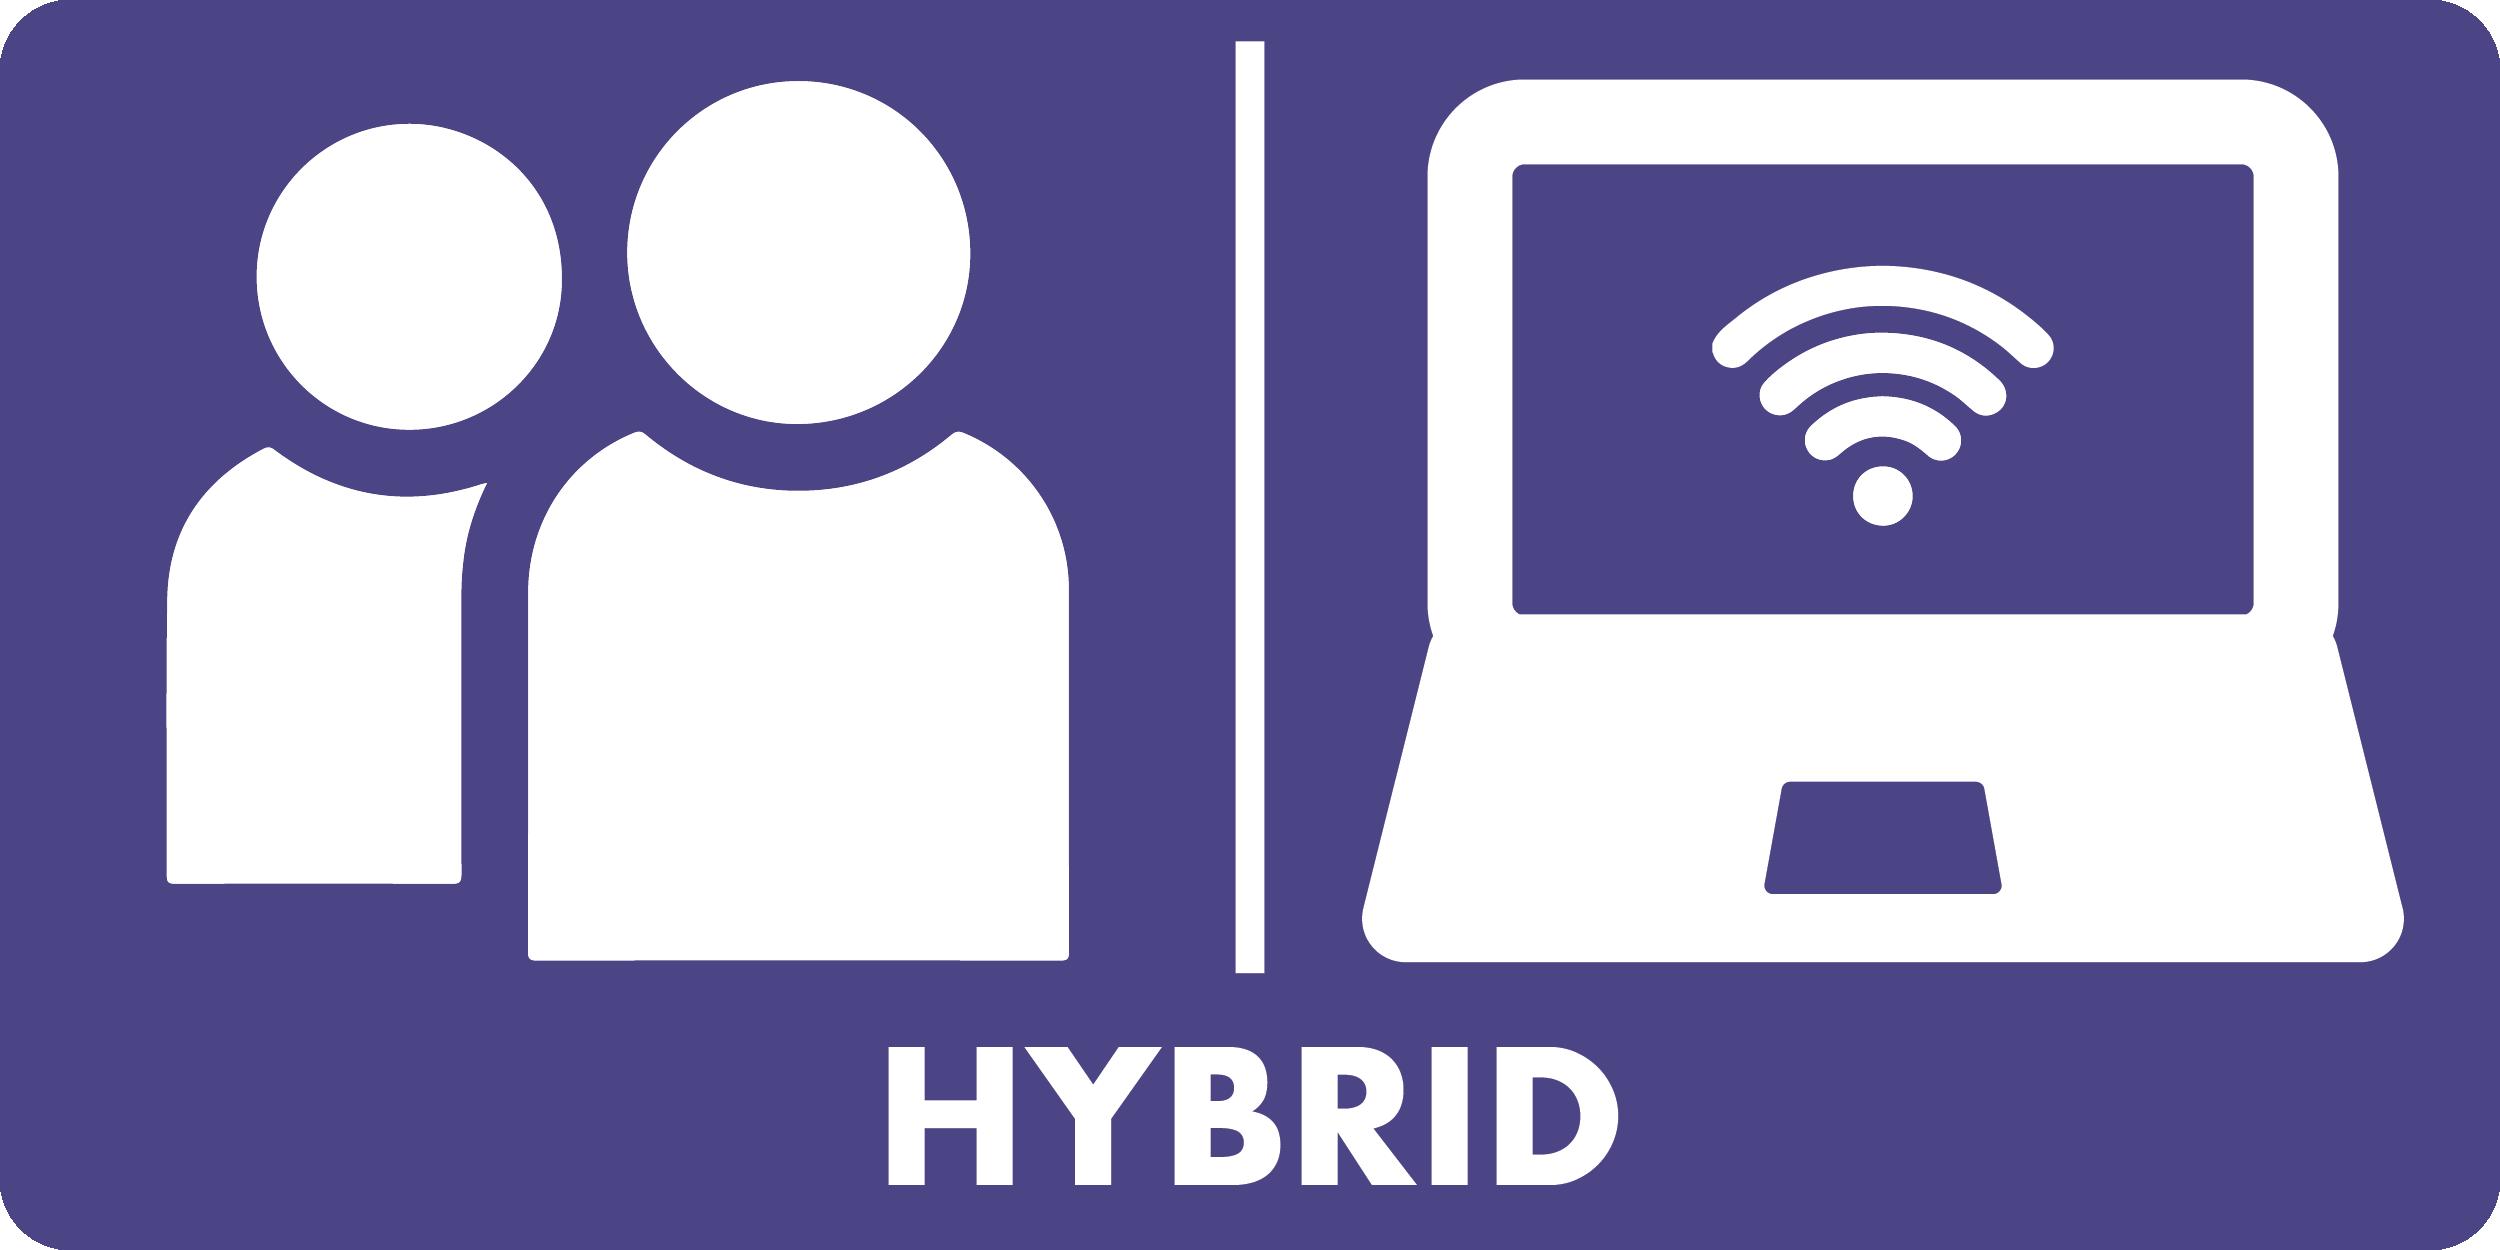 hybrid icon - solid